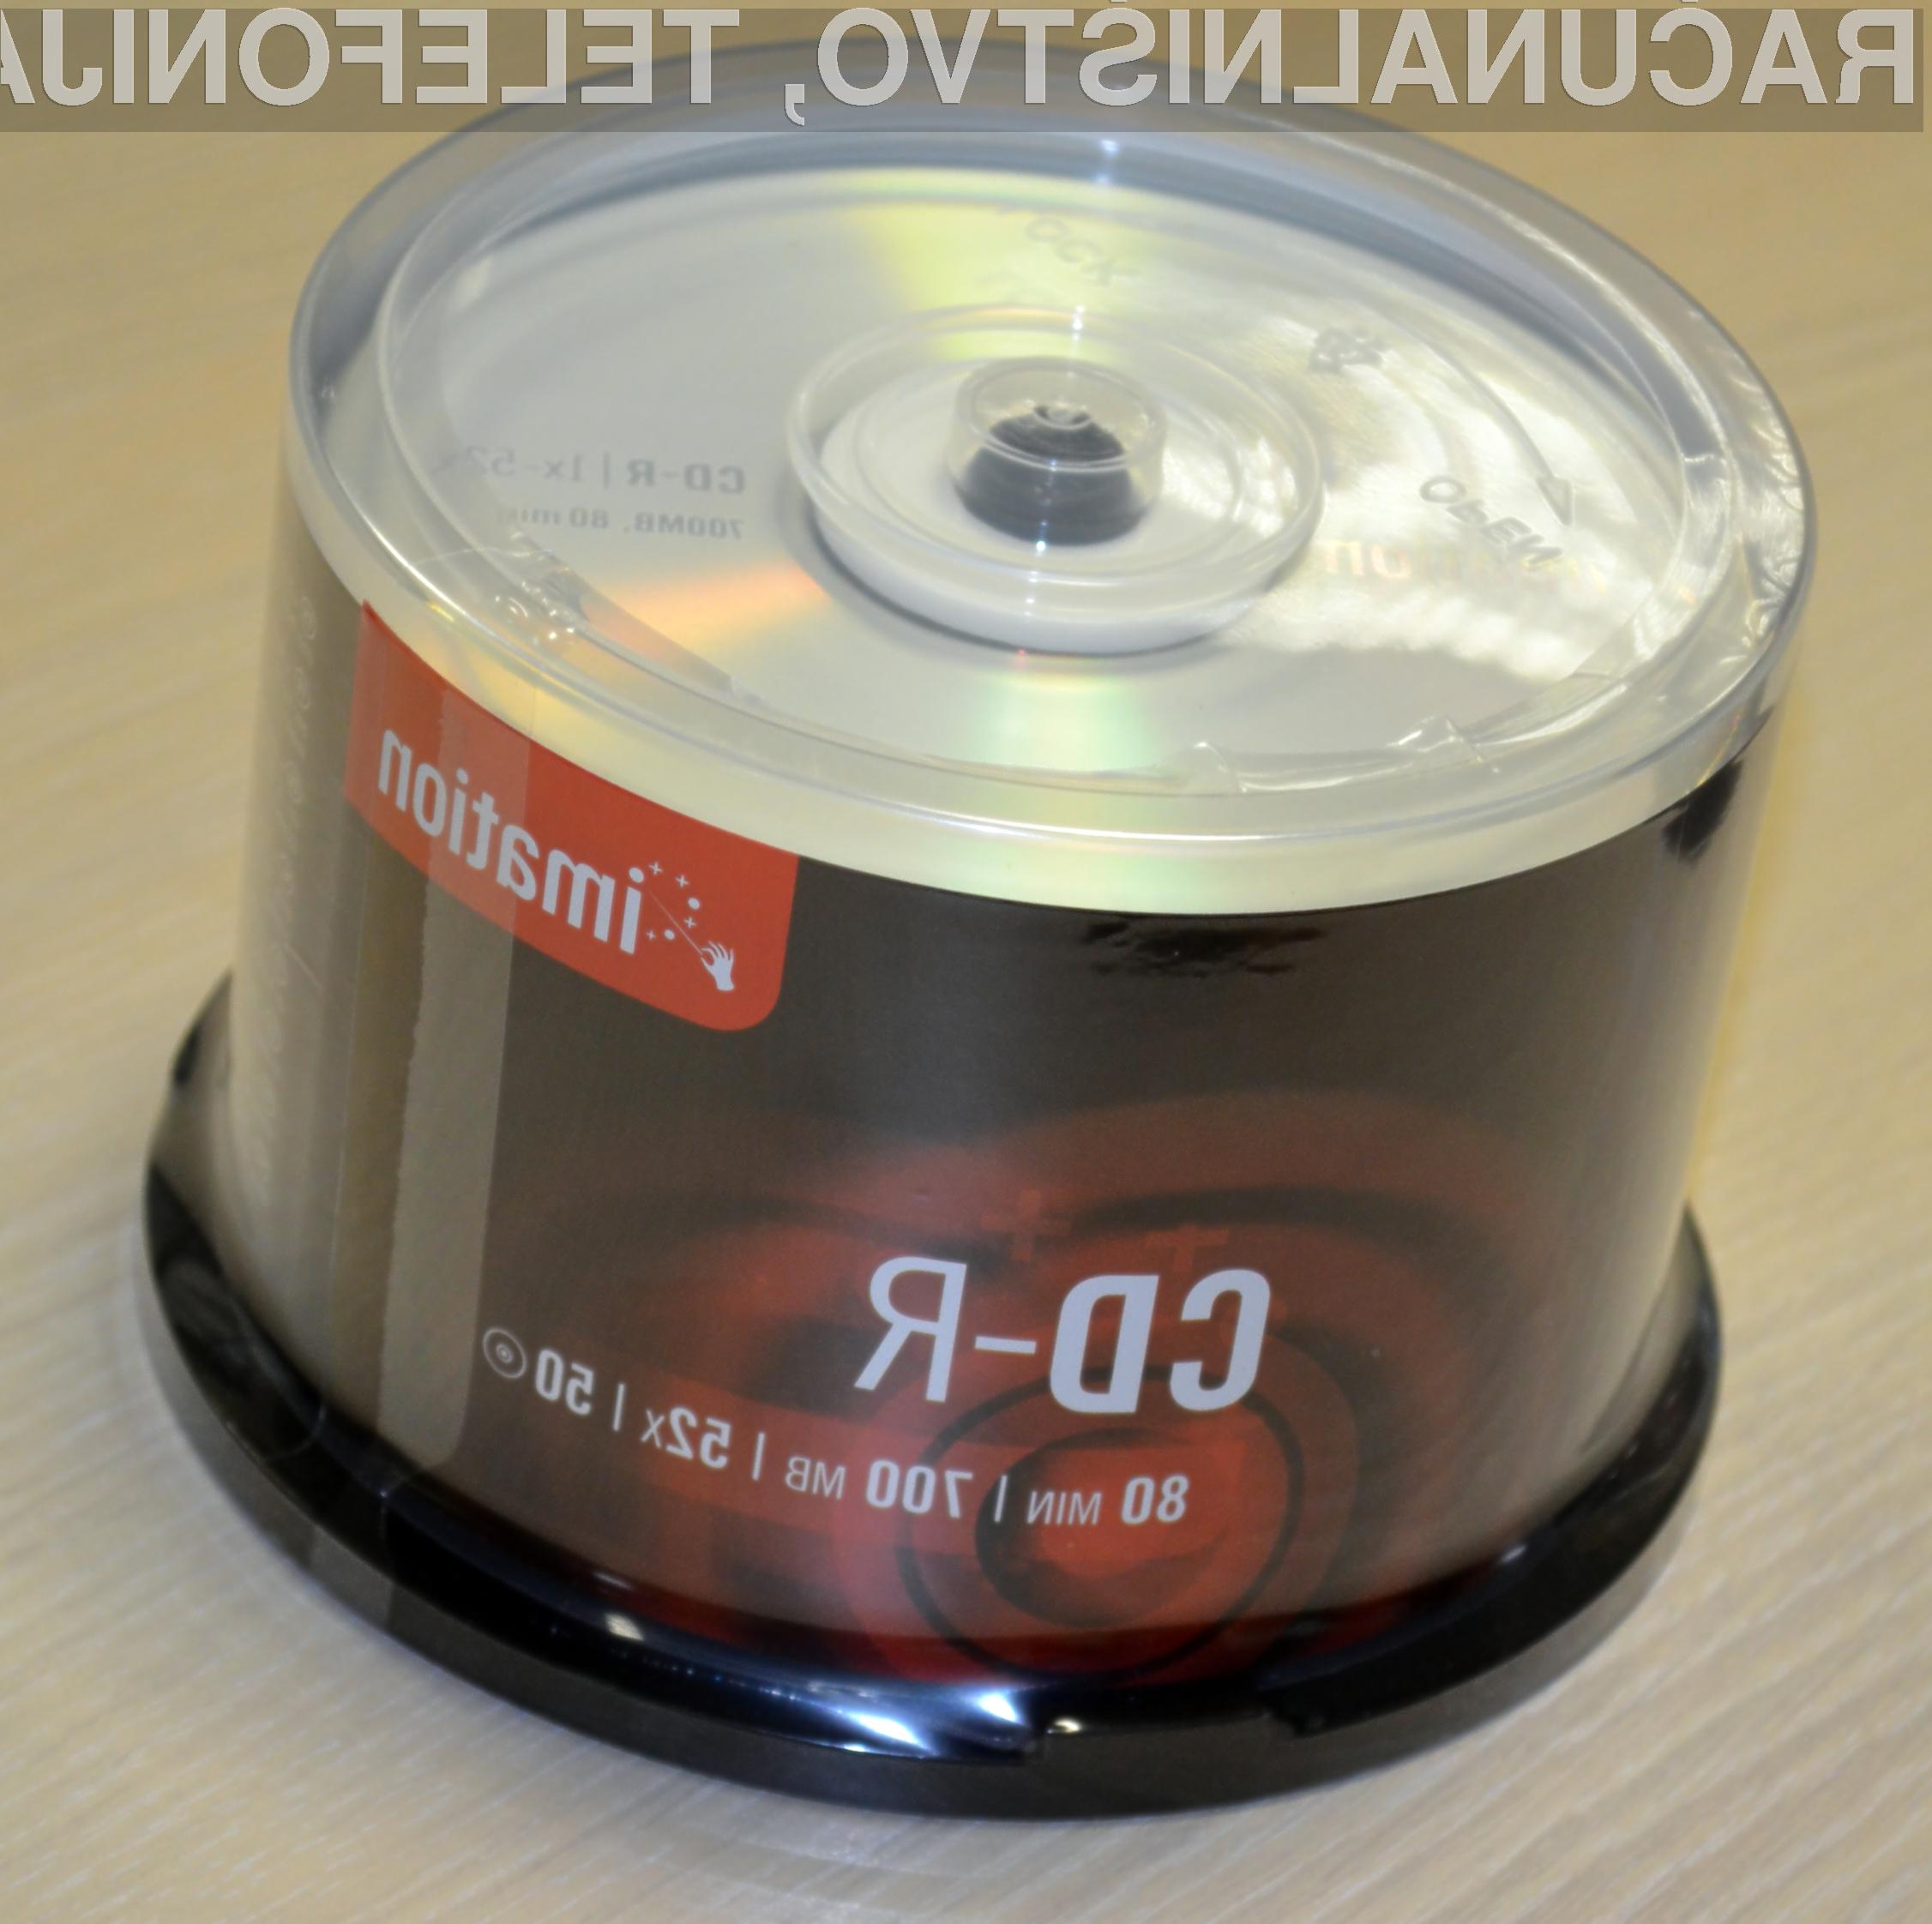 Tortica 50x CD-R Imation 700MB, 80 min